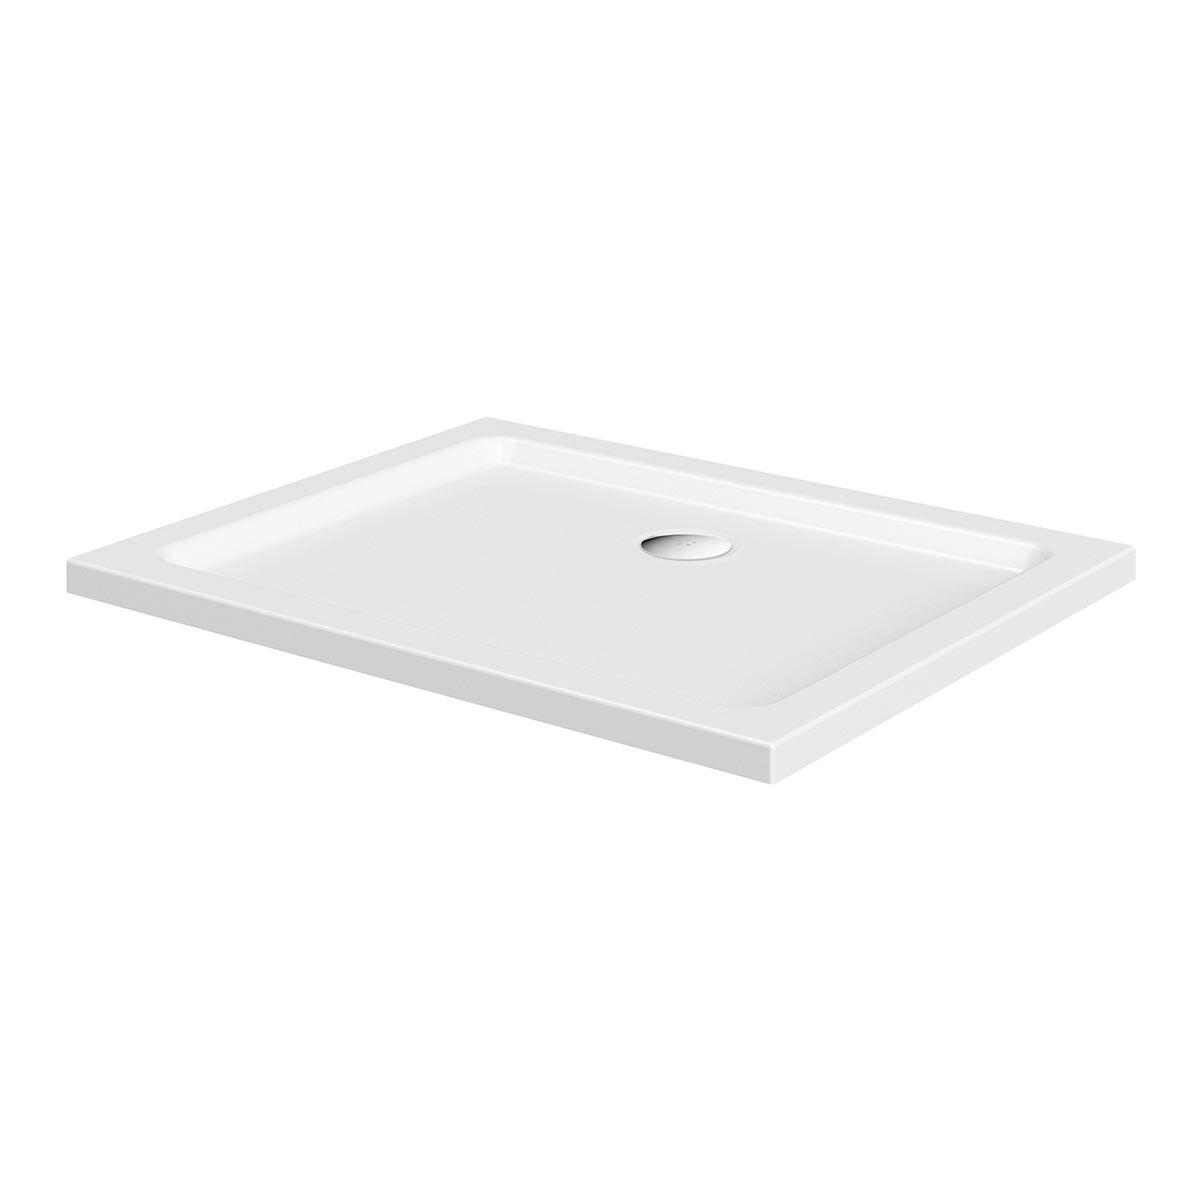 Simplite Rectangular Shower Tray | Trays